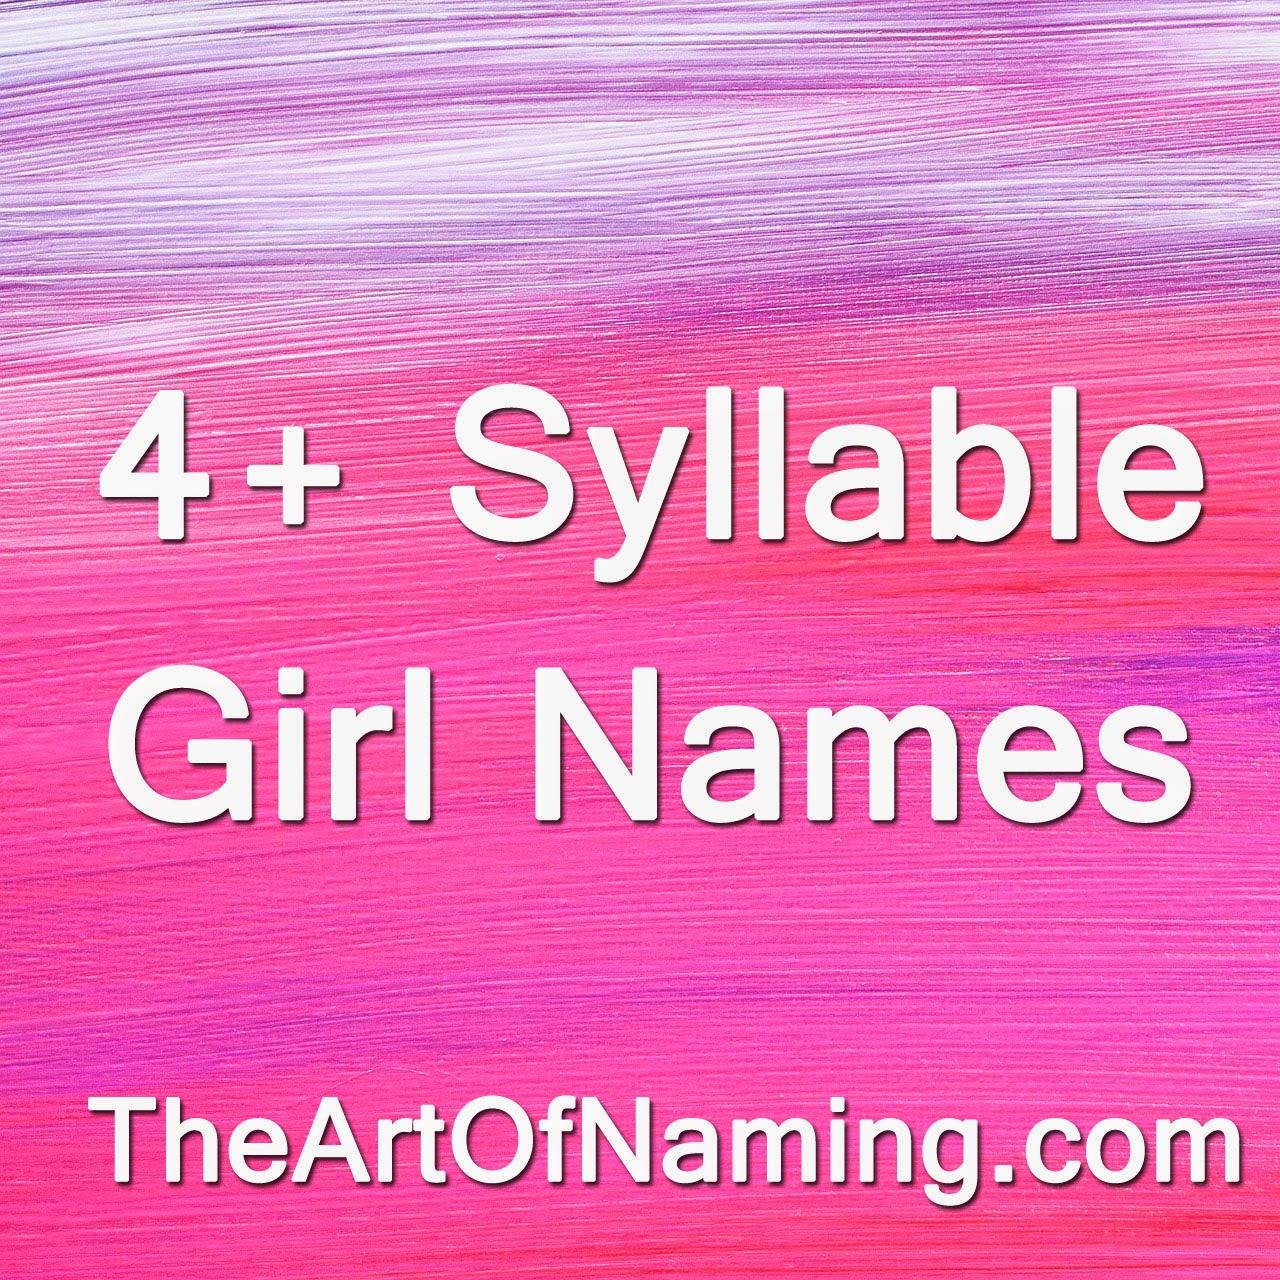 the art of naming beyond elizabeth 4 syllable girl names